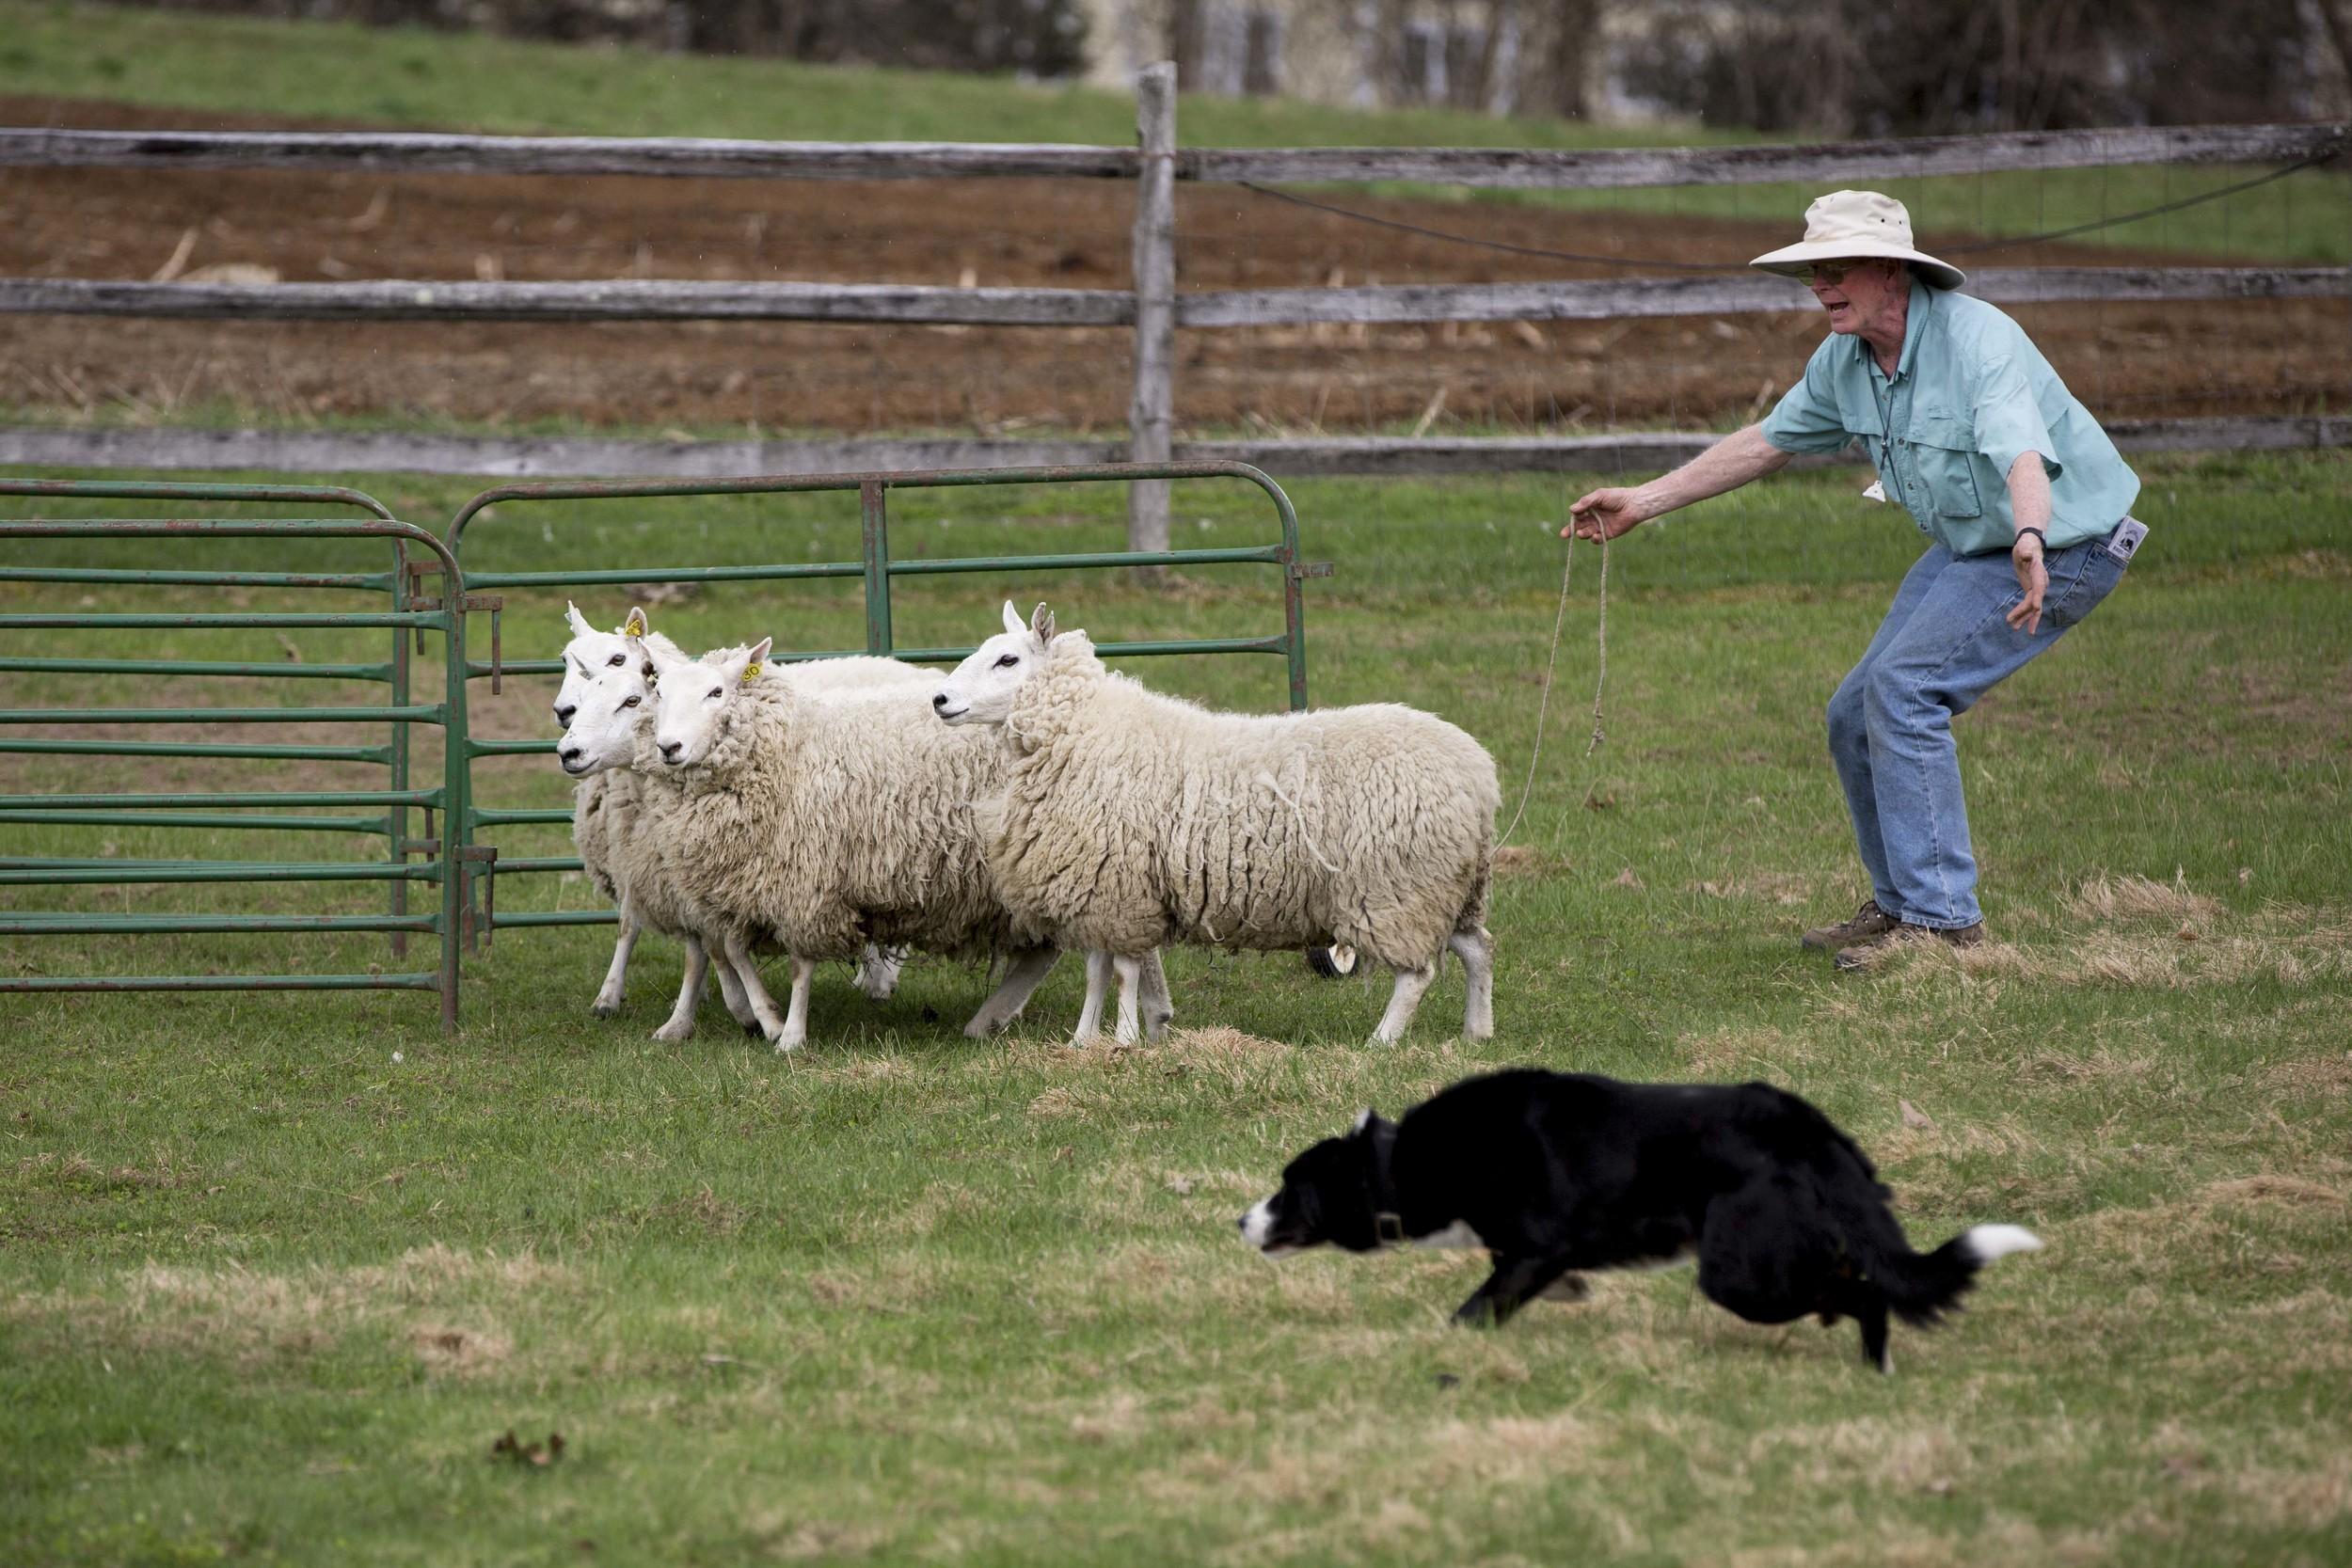 20150503-vn-sheep-ss-105.JPG